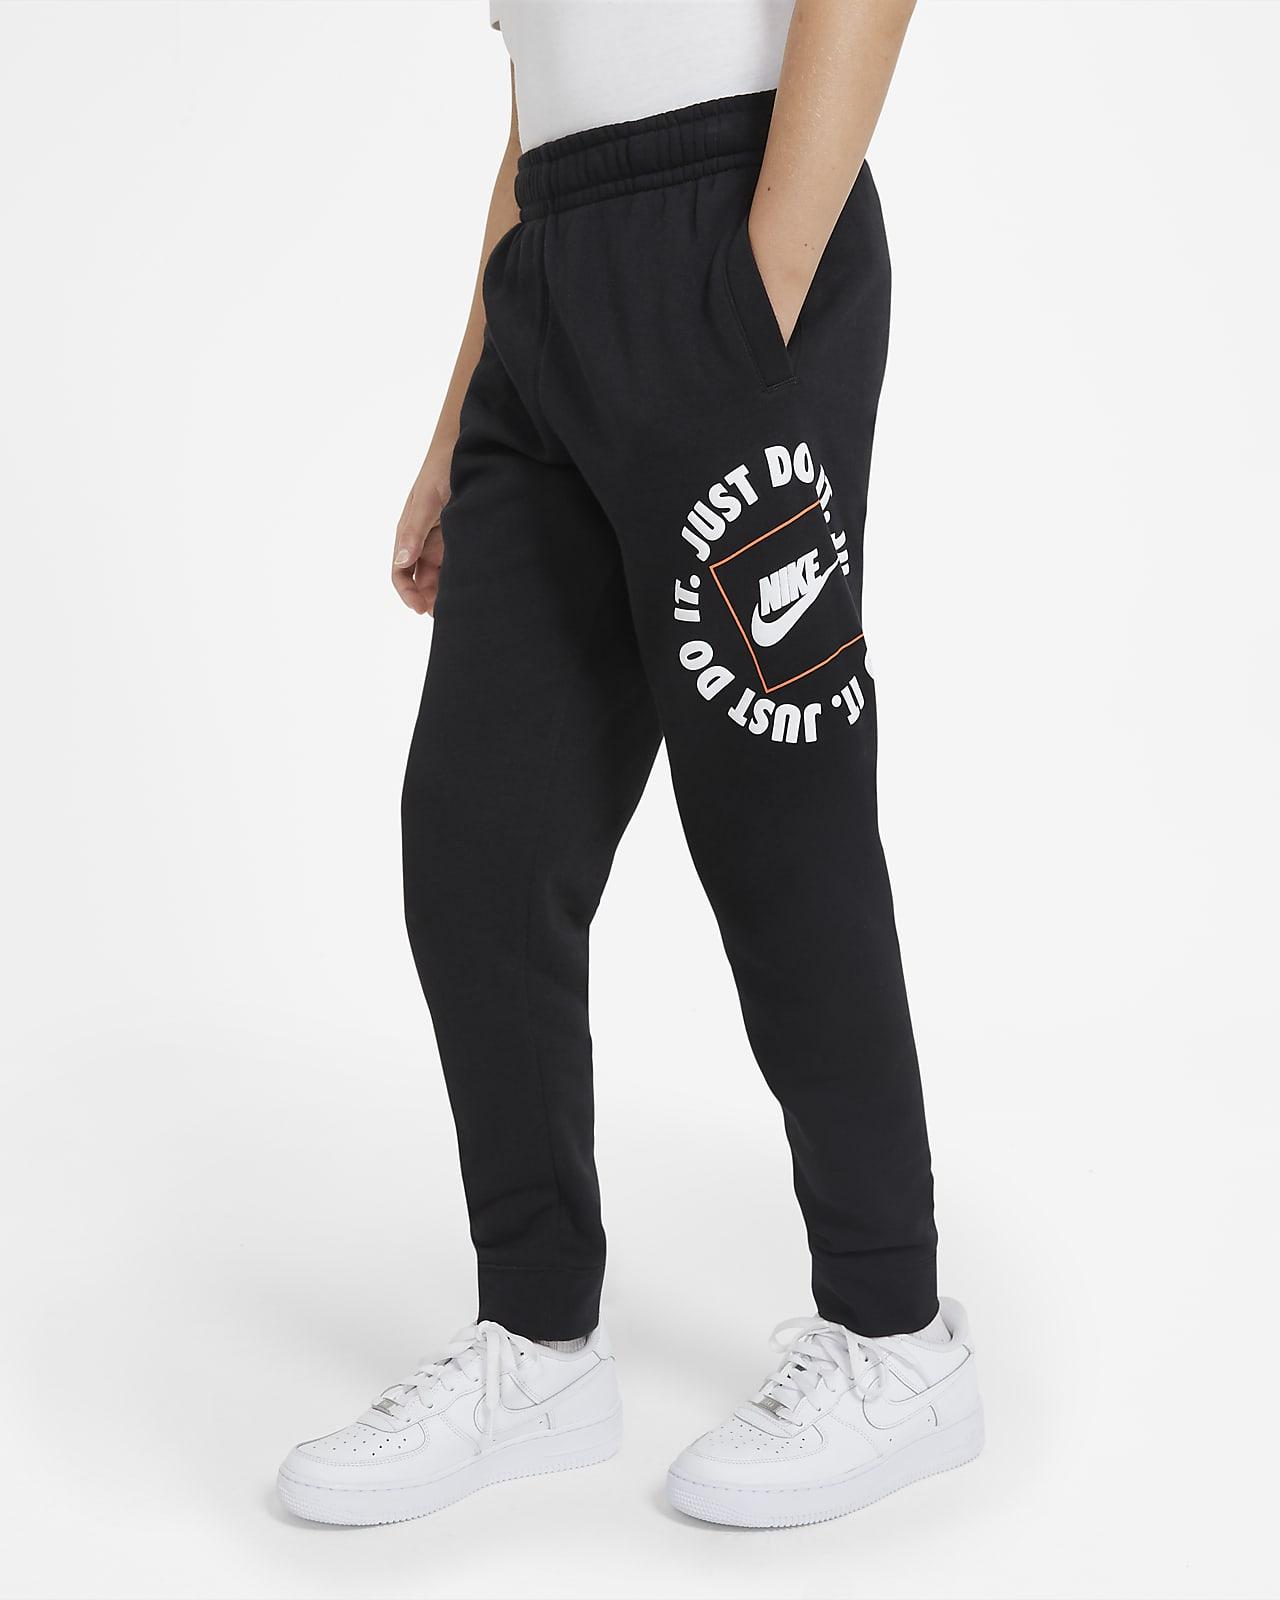 Nike Sportswear JDI Hose für ältere Kinder (Jungen)